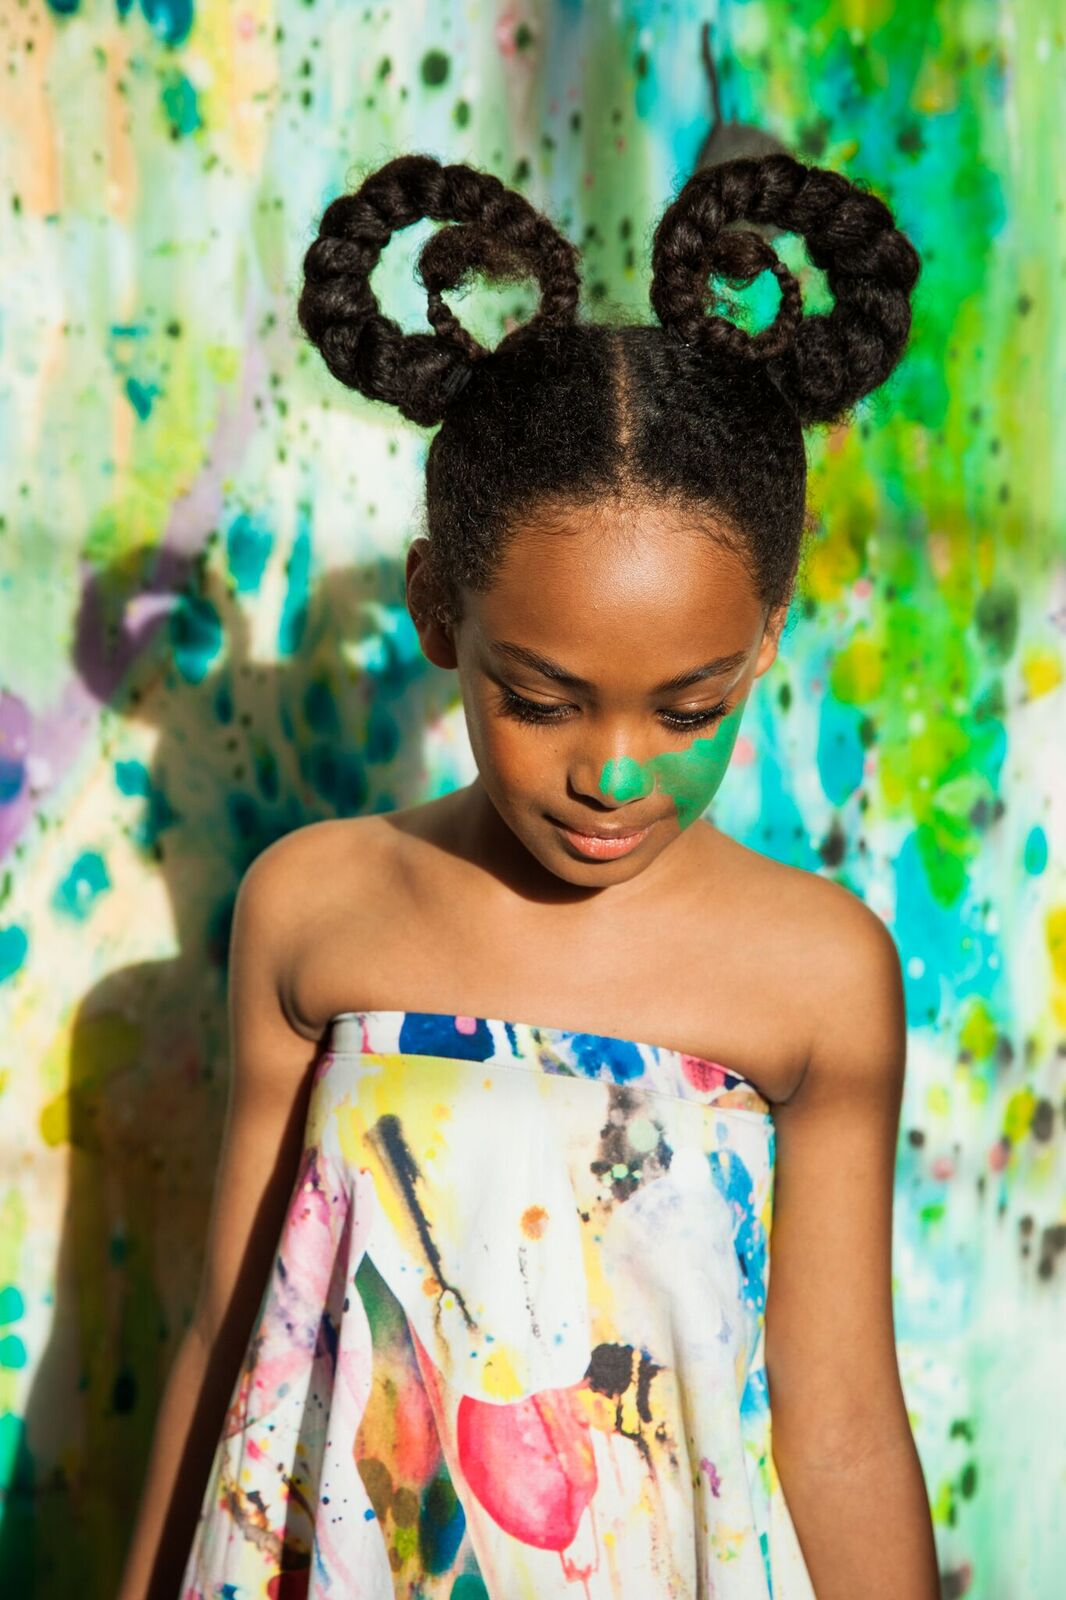 WA Makeup and Hair Artist